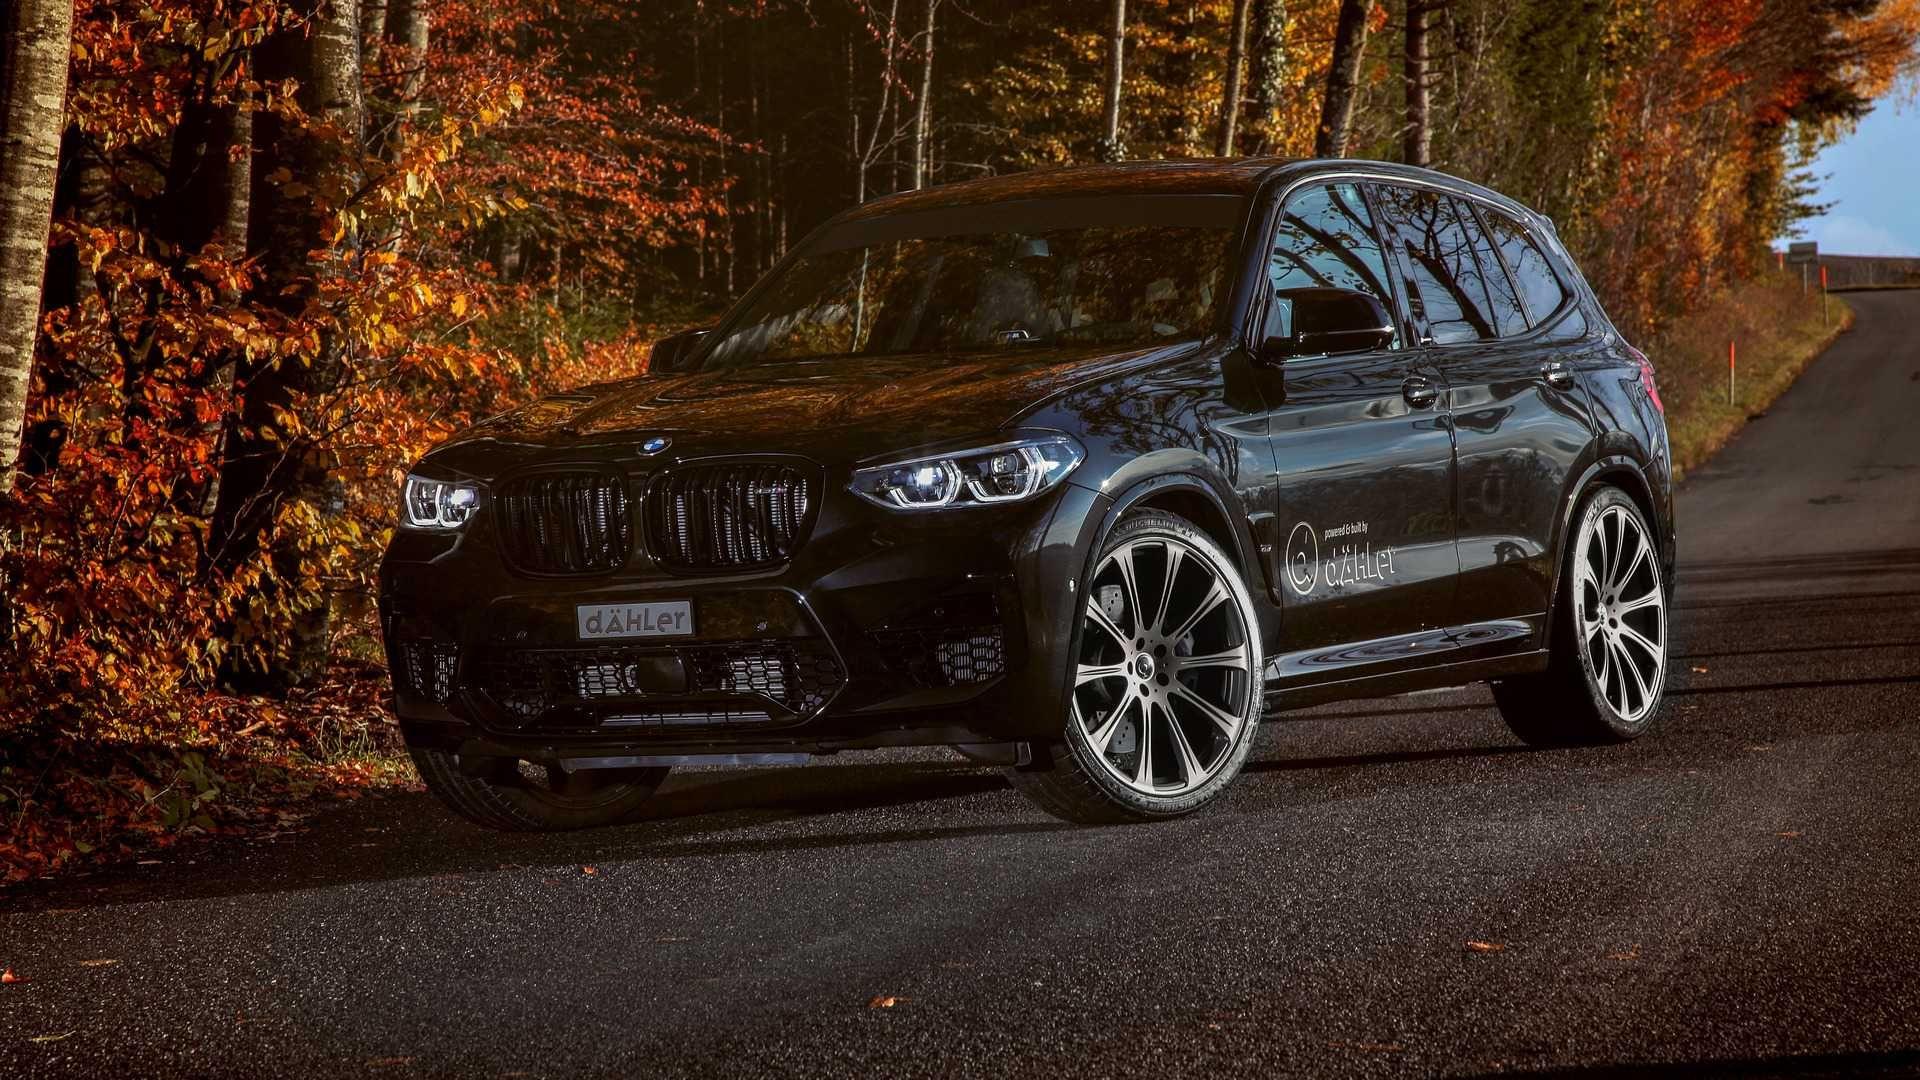 Dahler Take BMW X3 M And X4 M Up To 610 HP (449 kW) in